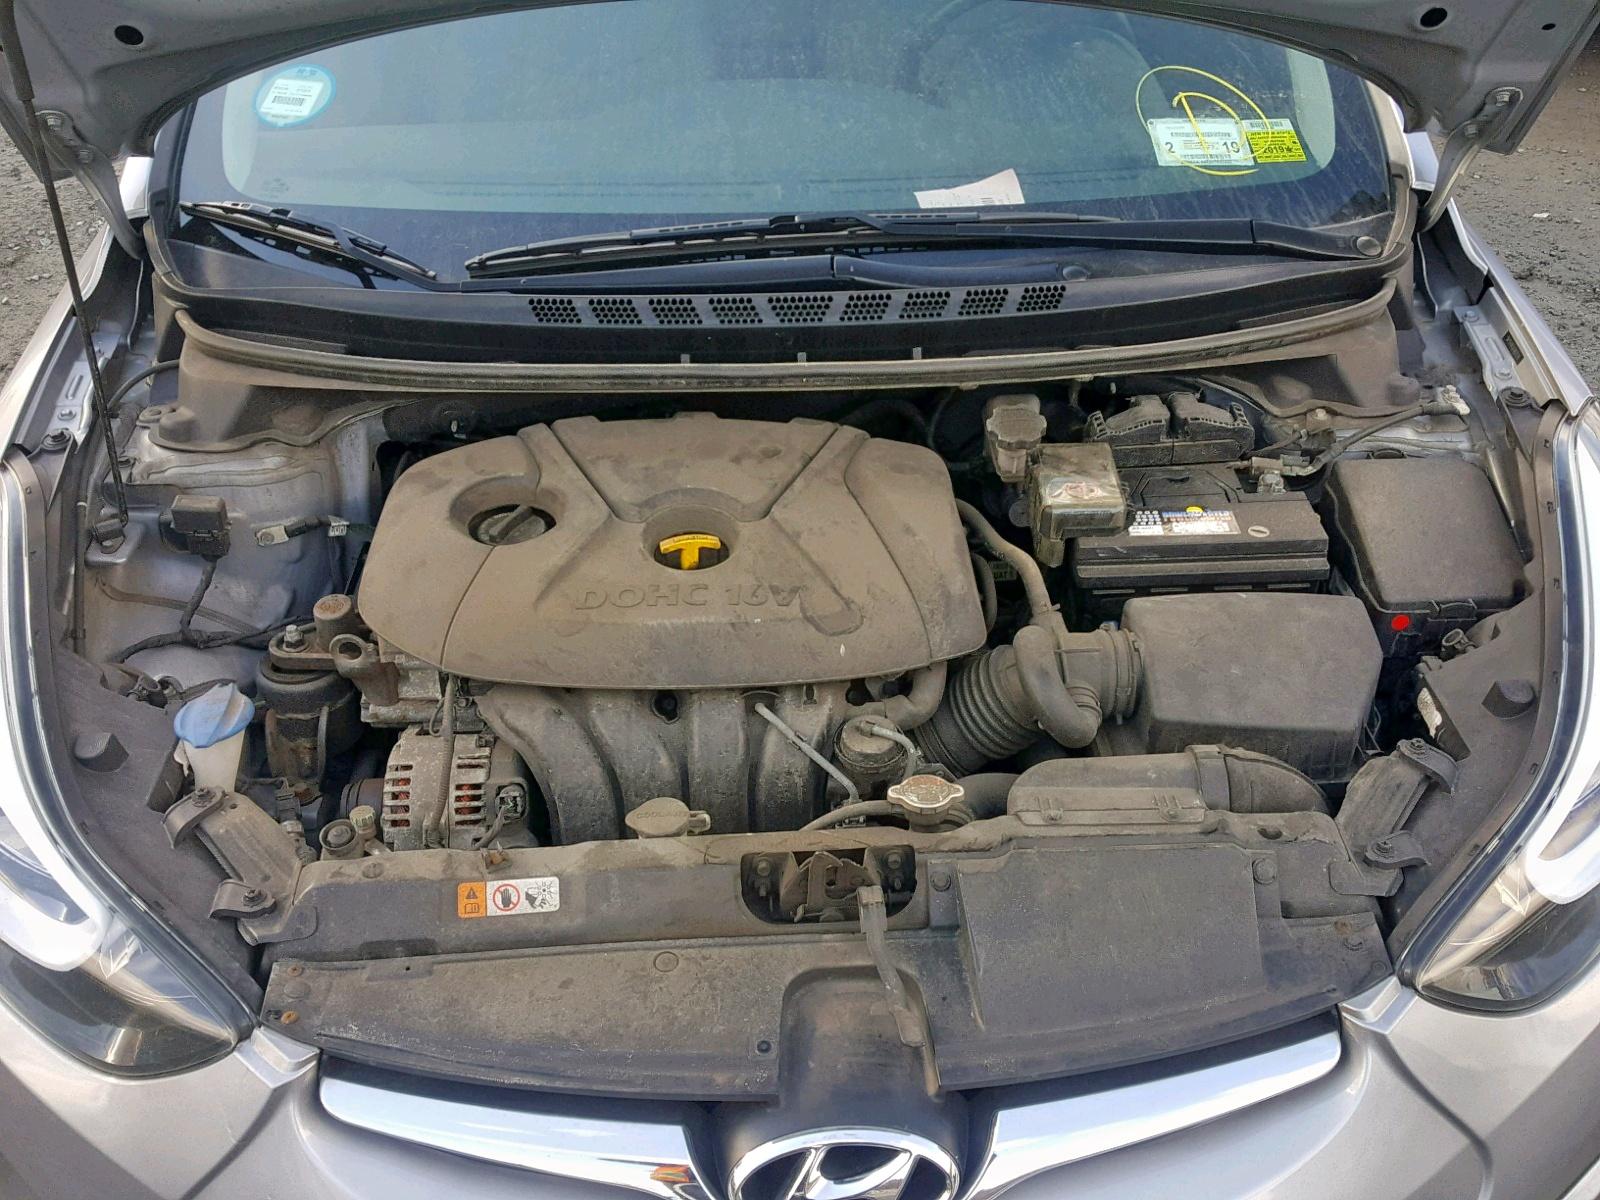 2015 Hyundai Elantra Se 1.8L inside view